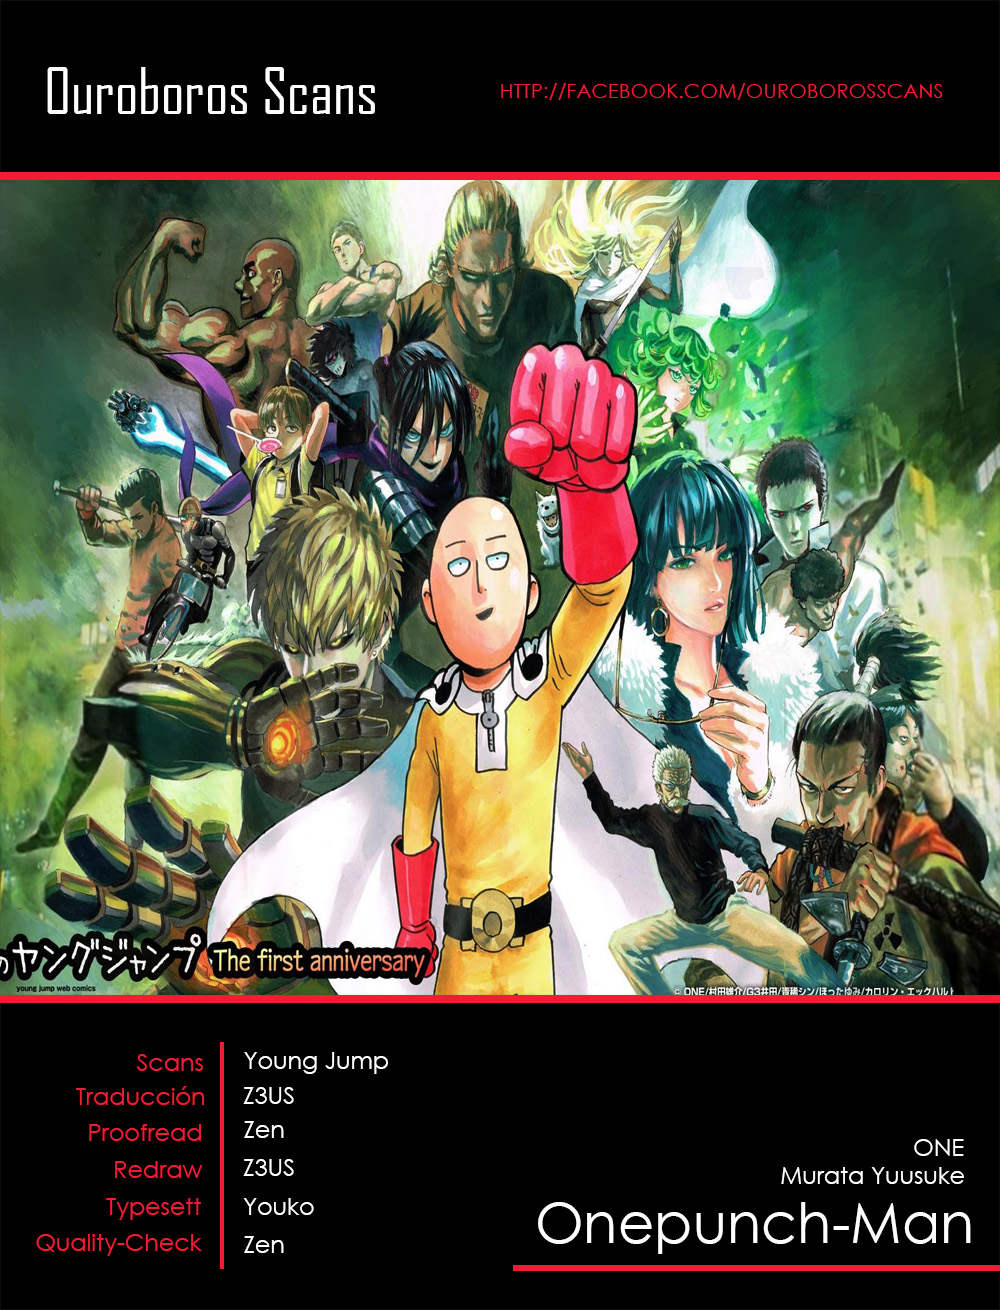 http://c5.ninemanga.com/es_manga/21/14805/382971/b5628fed964d280aab18f11d1afcd3fe.jpg Page 1